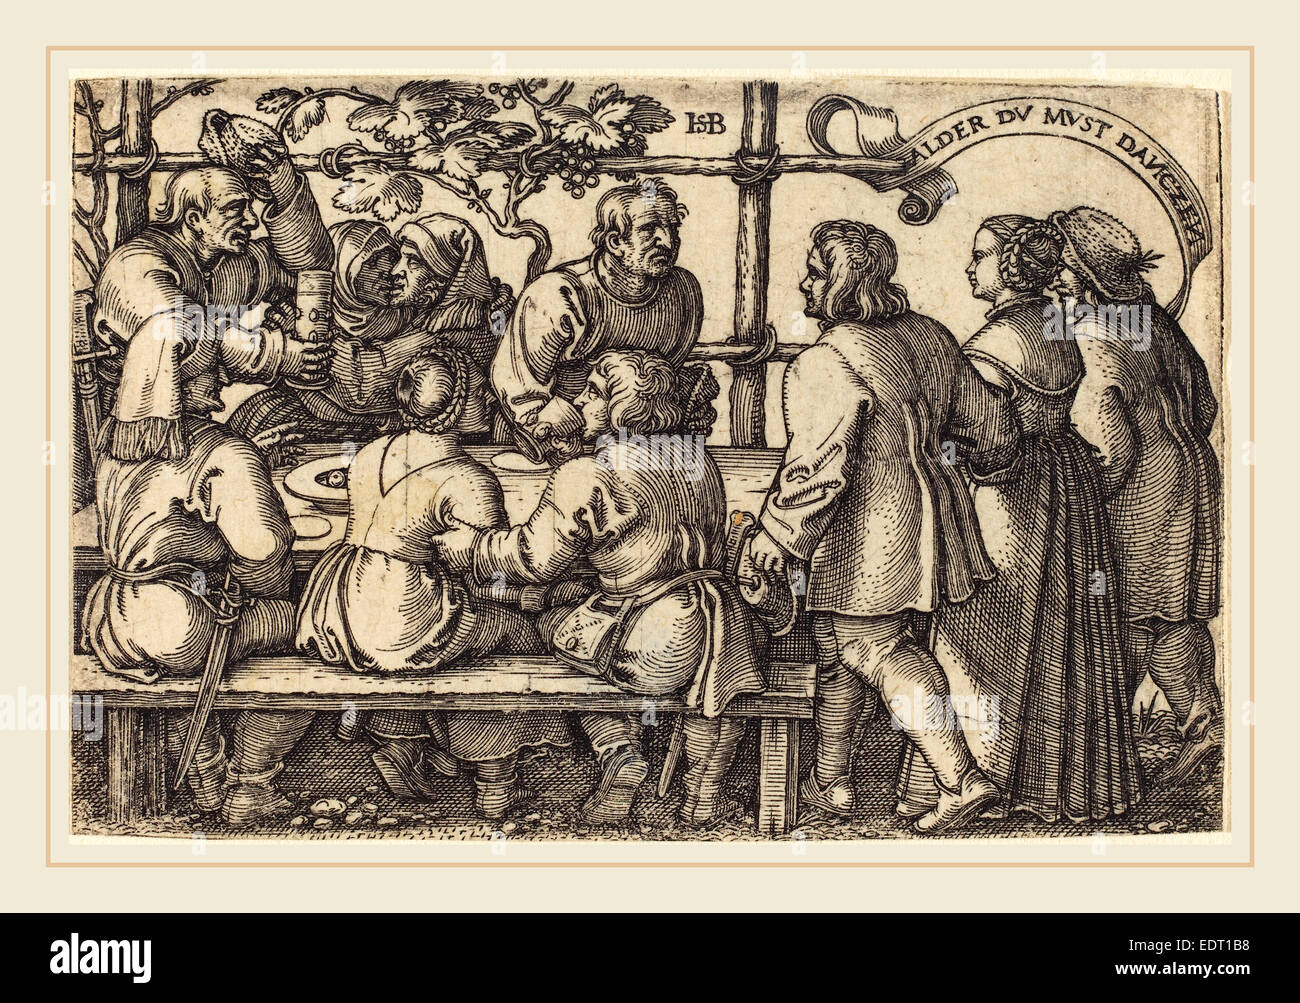 Sebald Beham (German, 1500-1550), Peasants' Feast, engraving - Stock Image